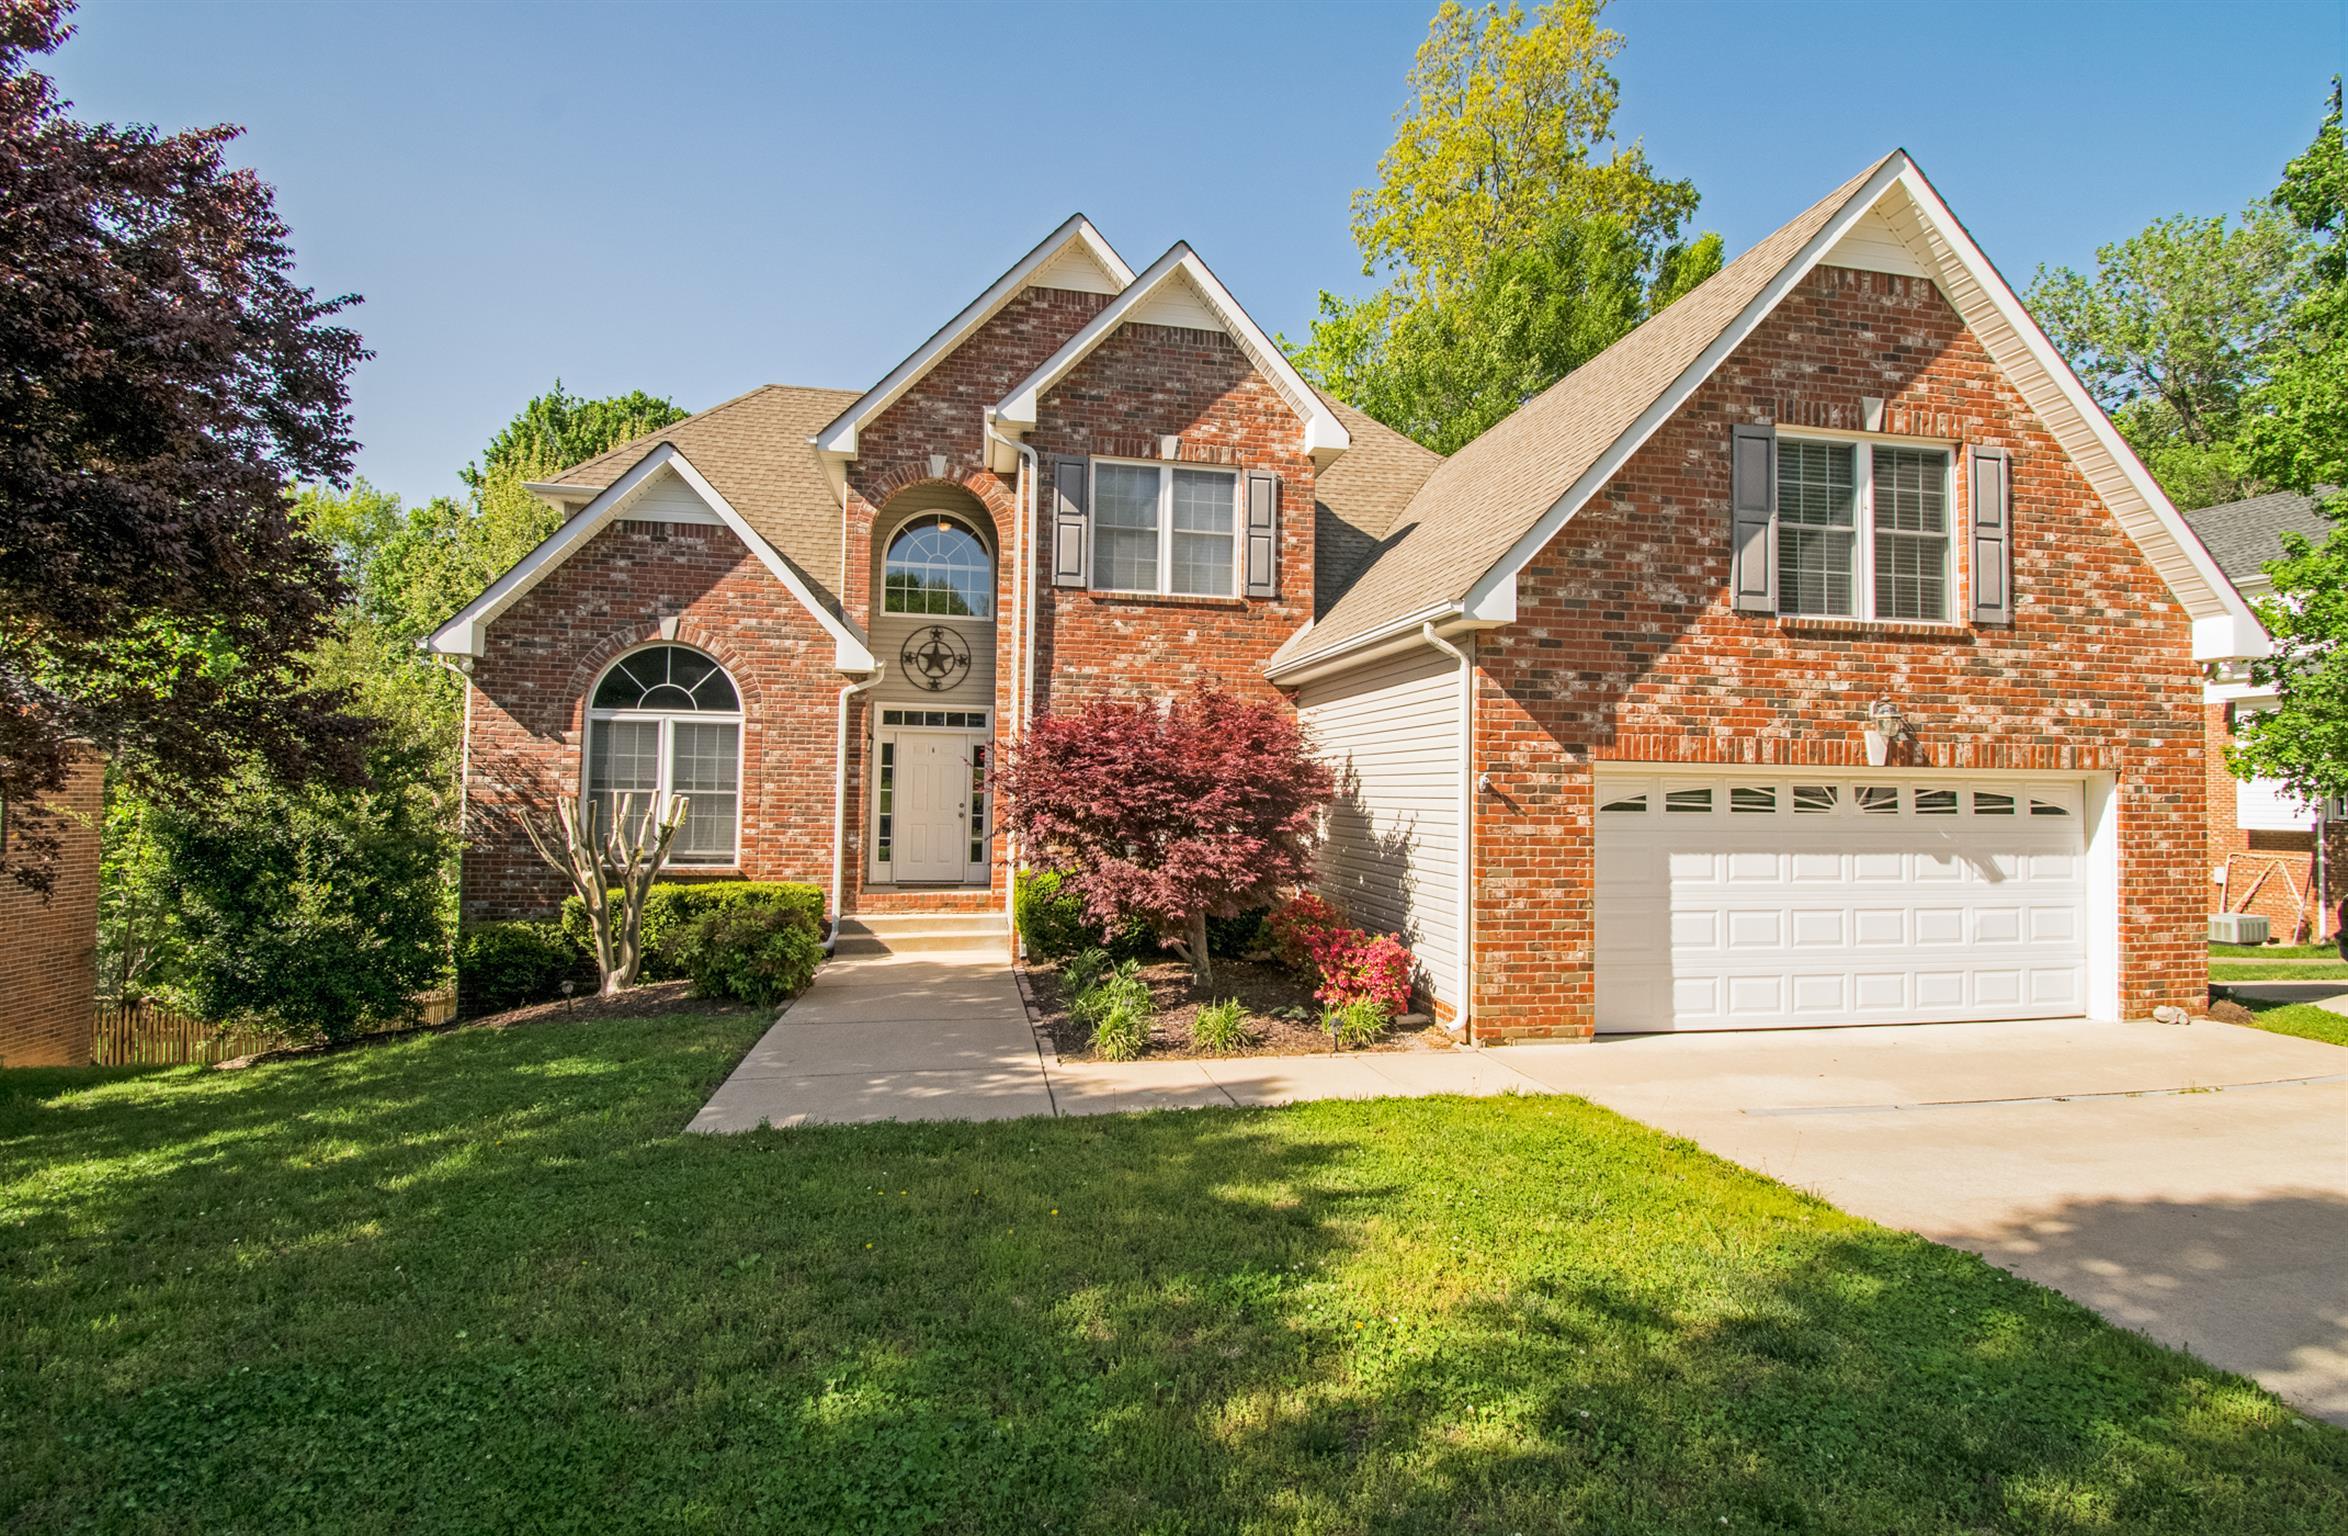 937 Glenraven Dr, Clarksville, TN 37043 - Clarksville, TN real estate listing